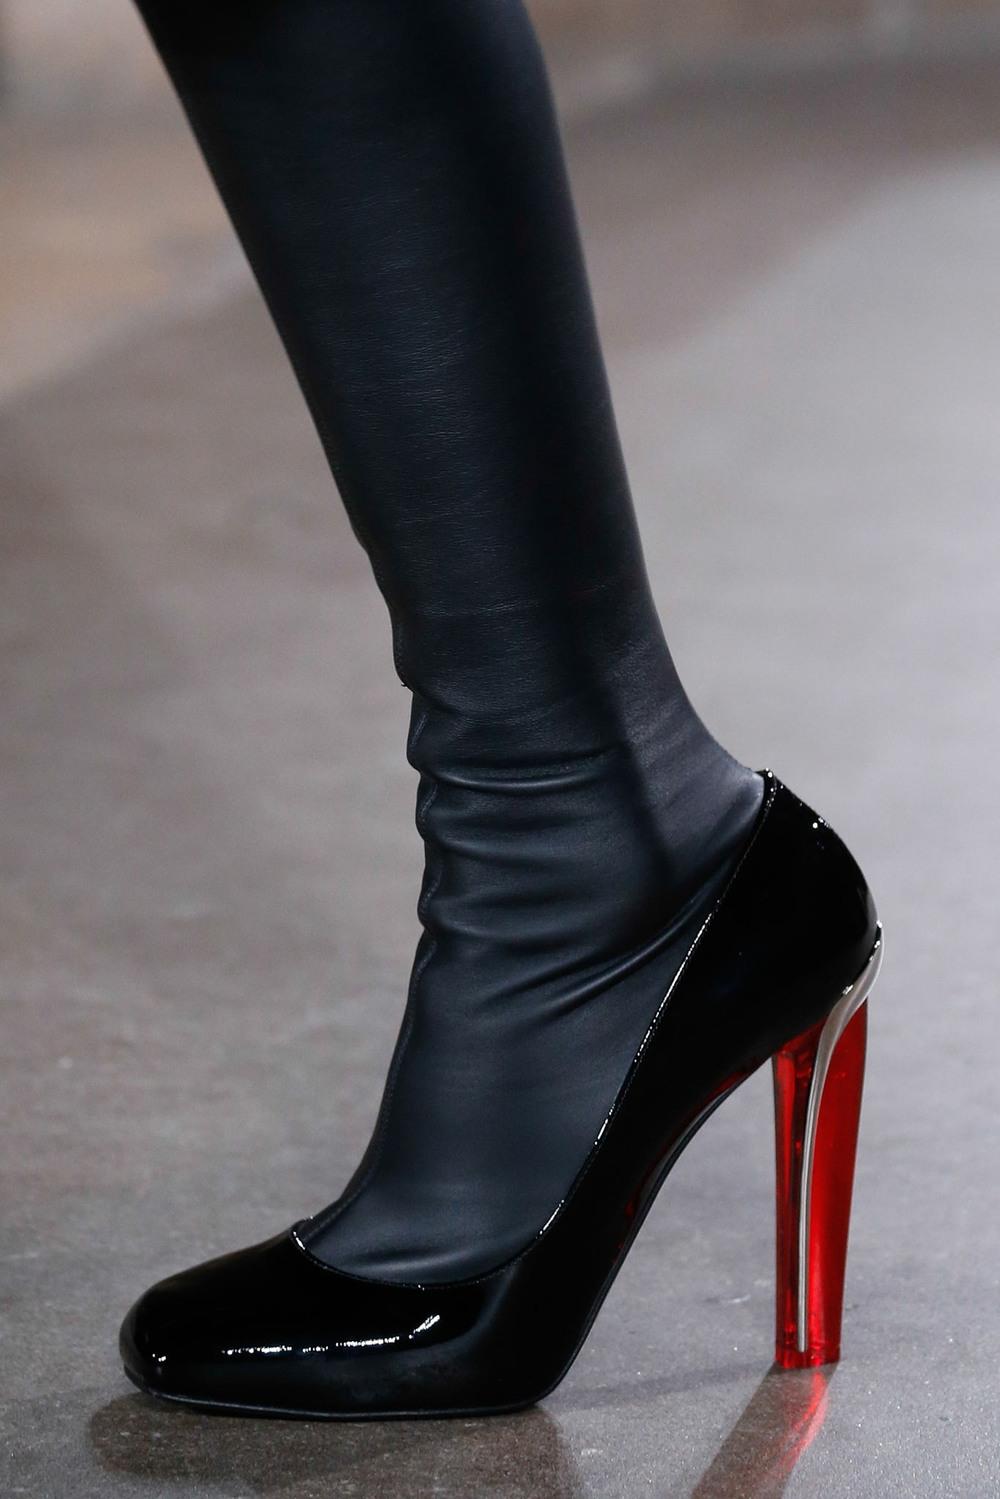 04-04-accessories-trends-fall-2015-lucite-heel.jpg